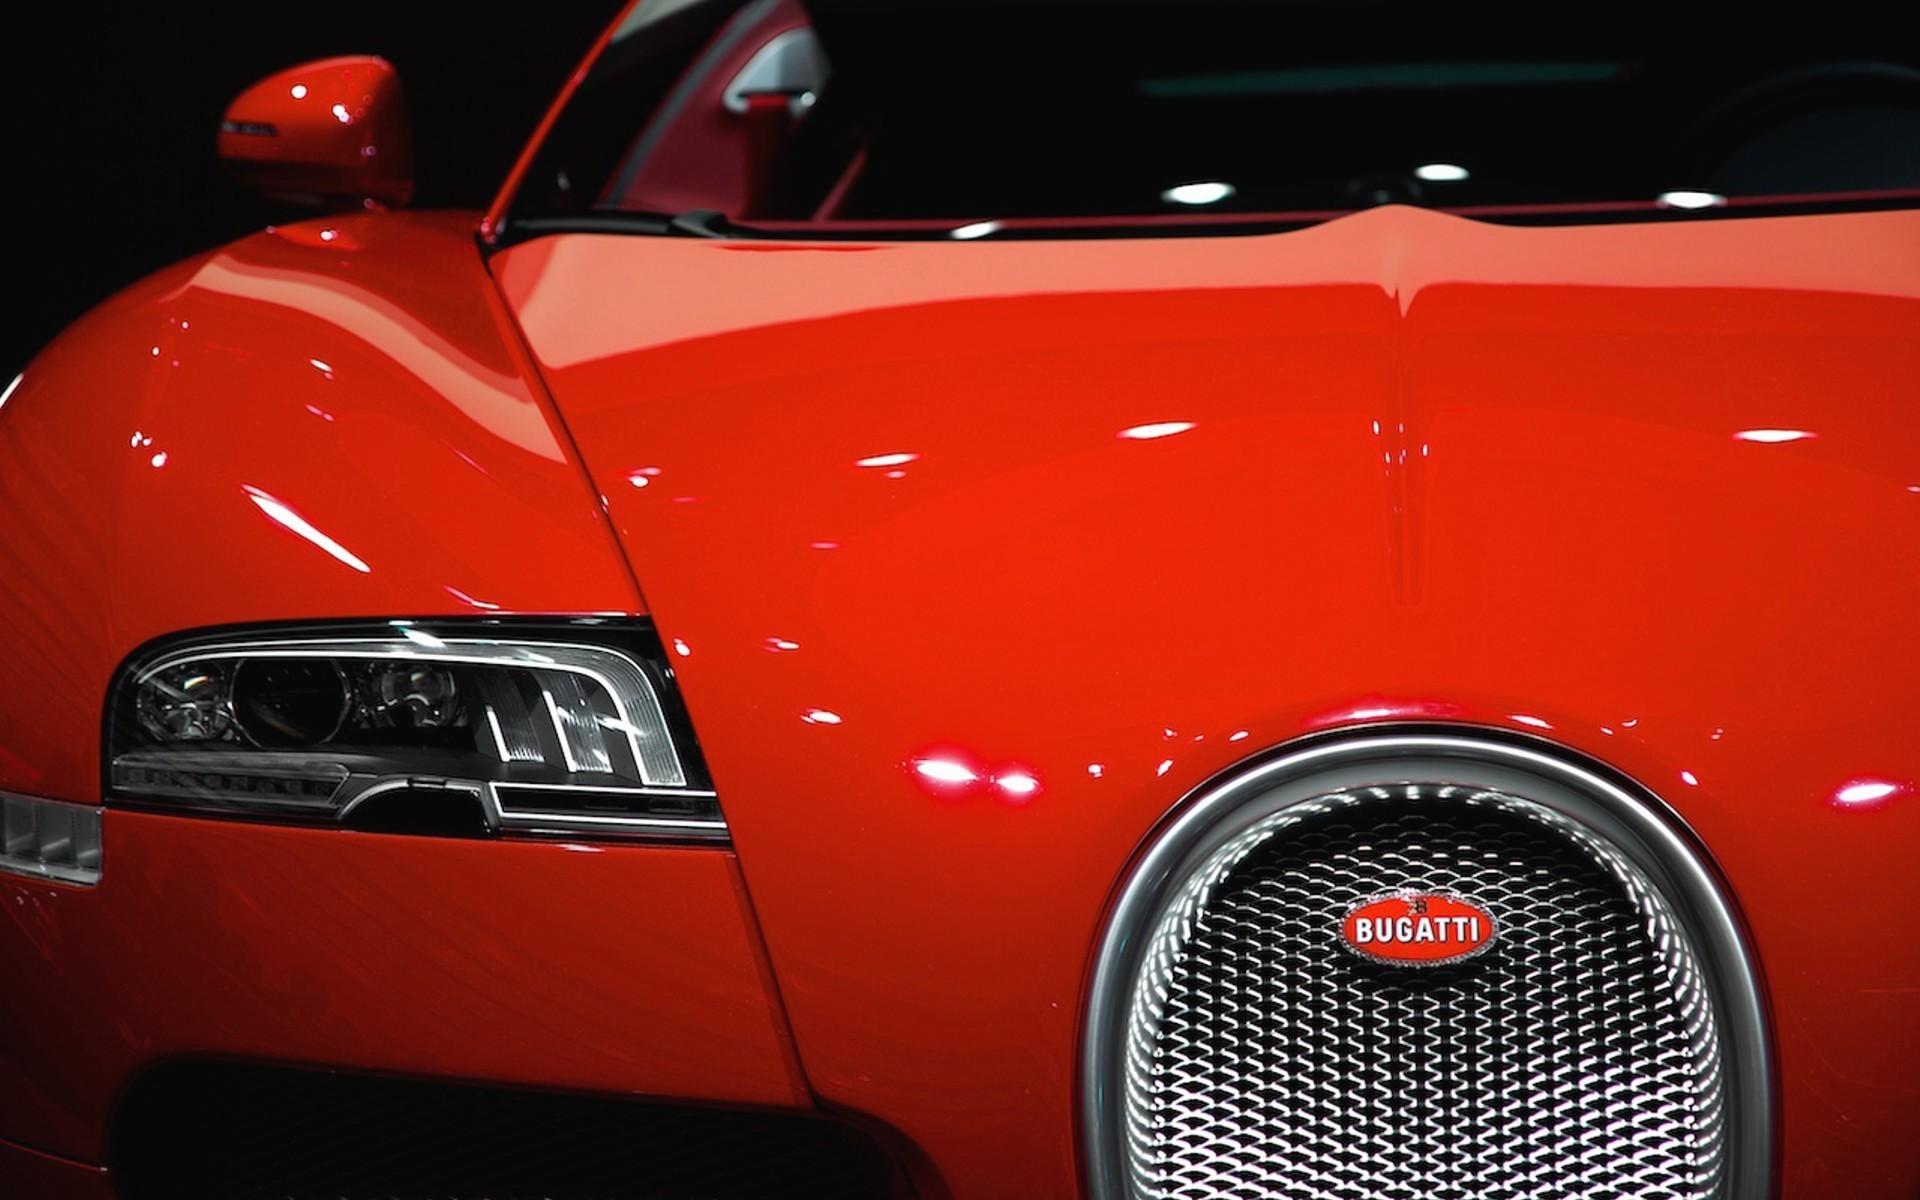 Wallpaper Of Bugatti Veyron 65 Pictures